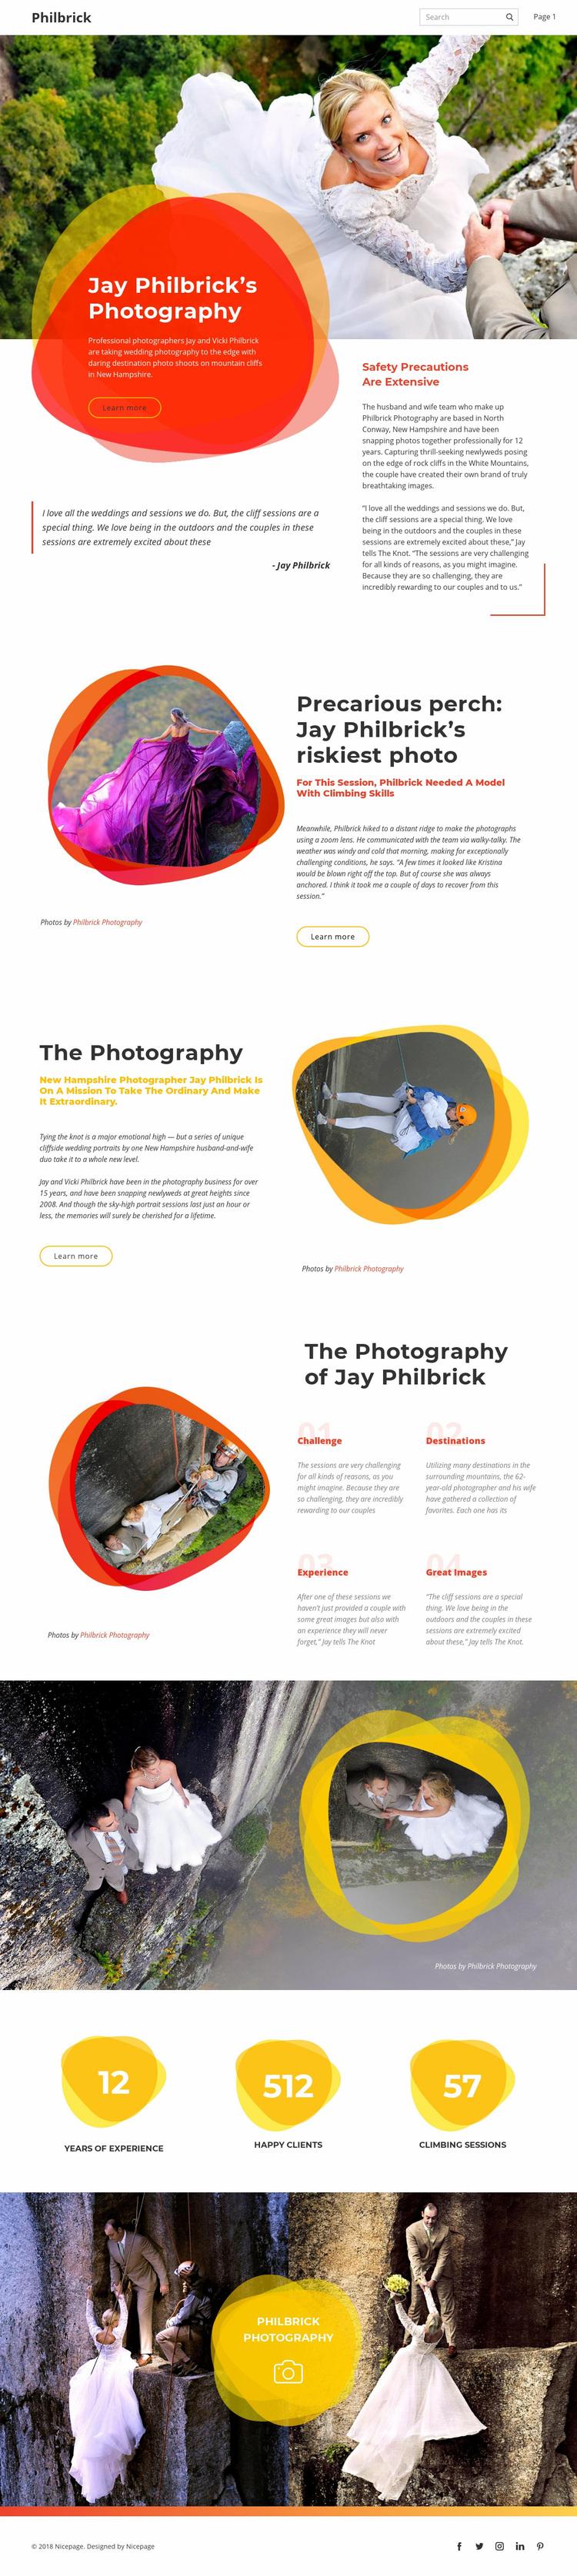 Rock climbing wedding Web Page Designer